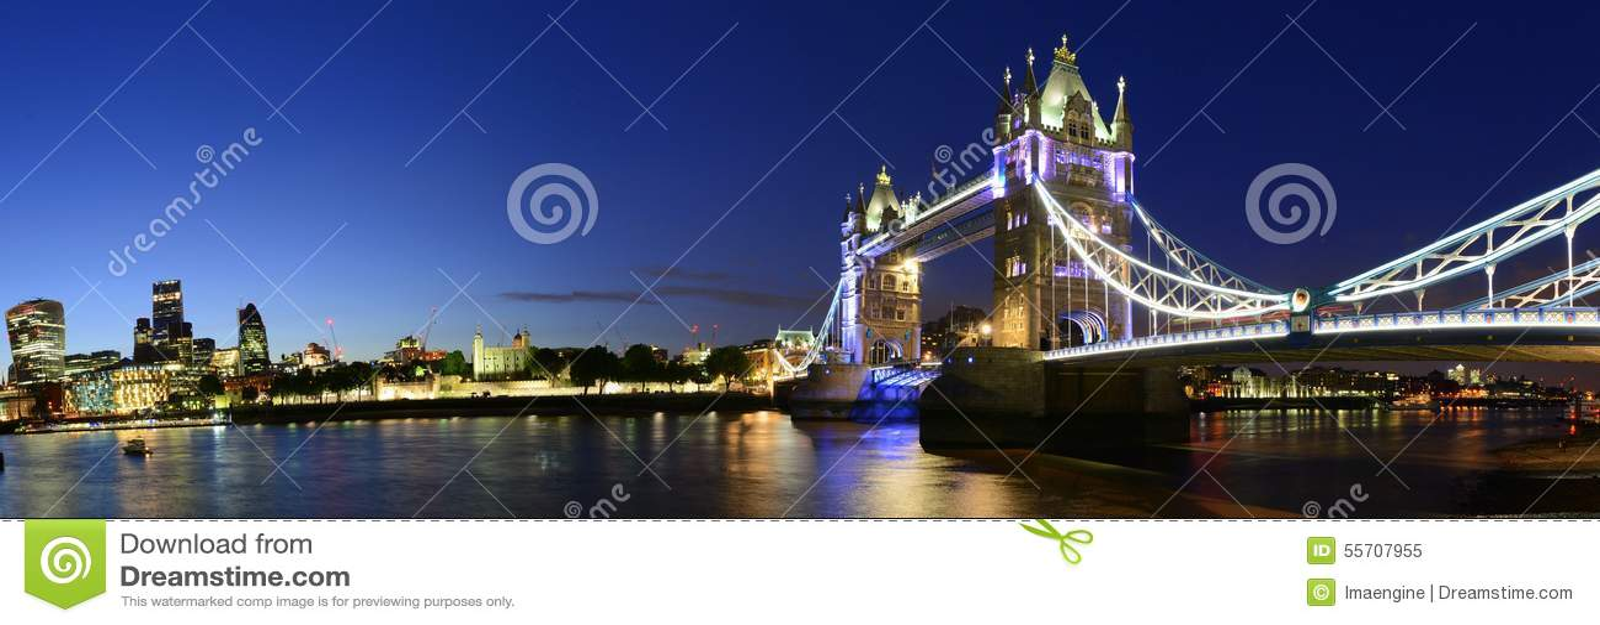 London Bridge over Thames river night panorama, UK